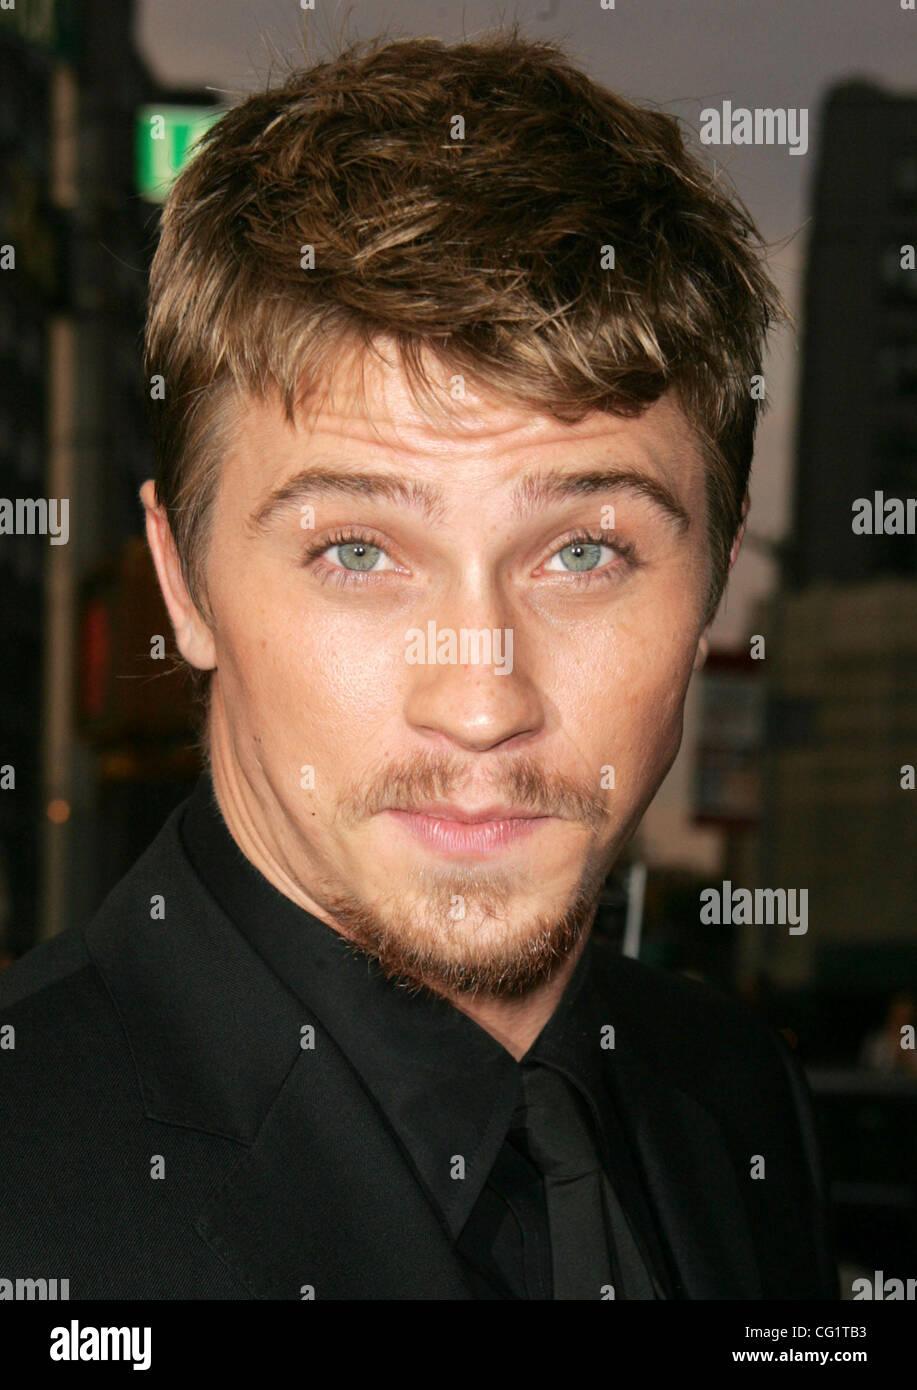 Garrett Hedlund Filmes intended for aug 28, 2007 - new york, ny, usa -actor garrett hedlund at the